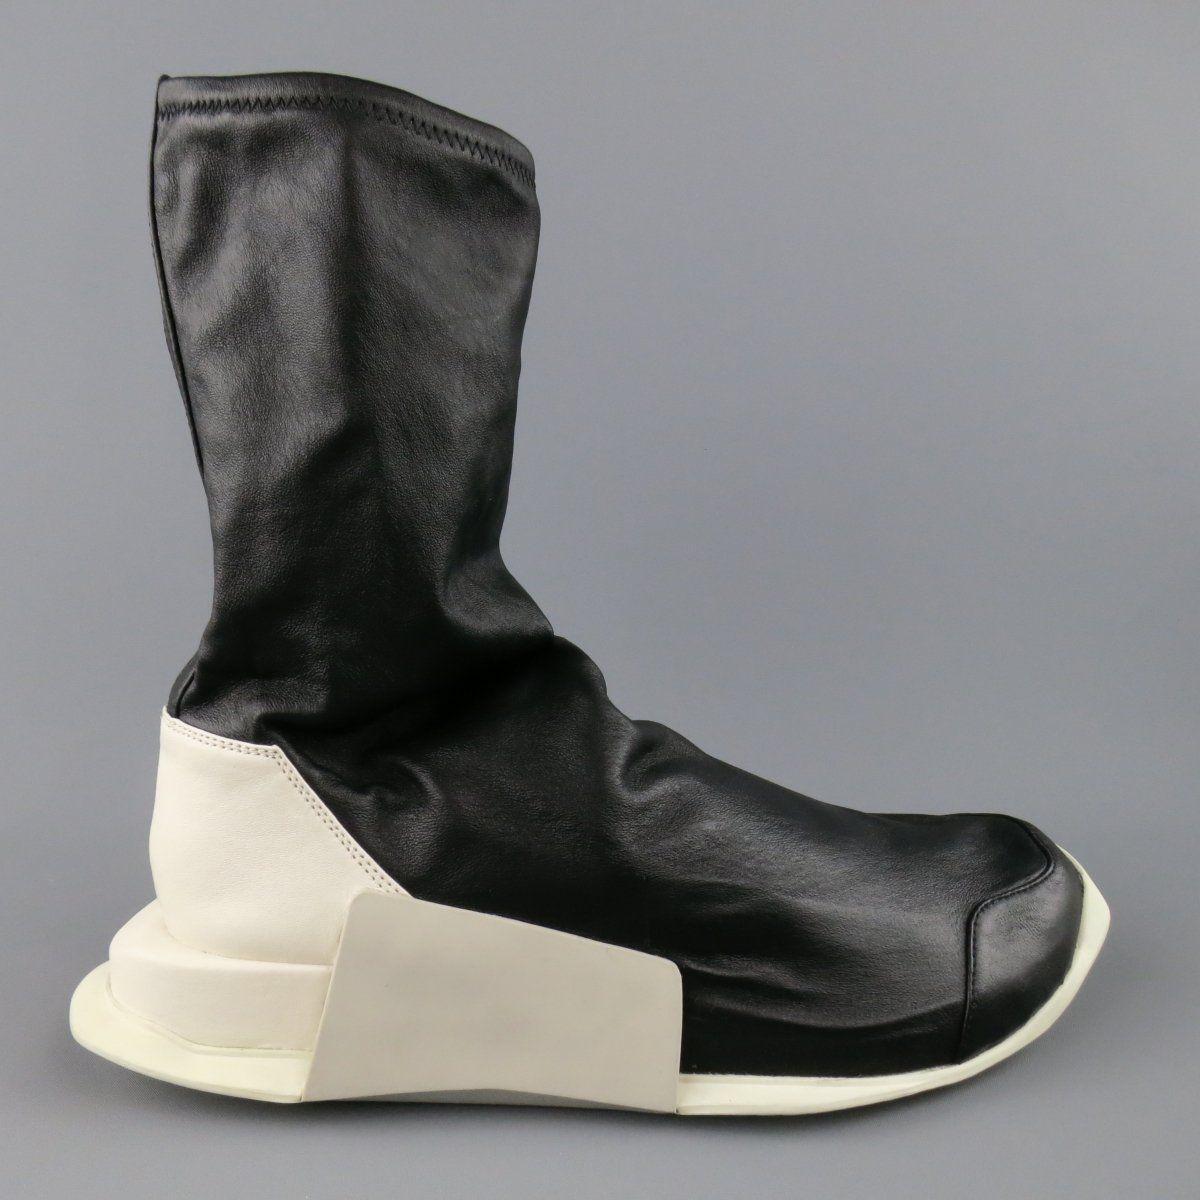 Rick Owens X Adidas Size 10.5 Black